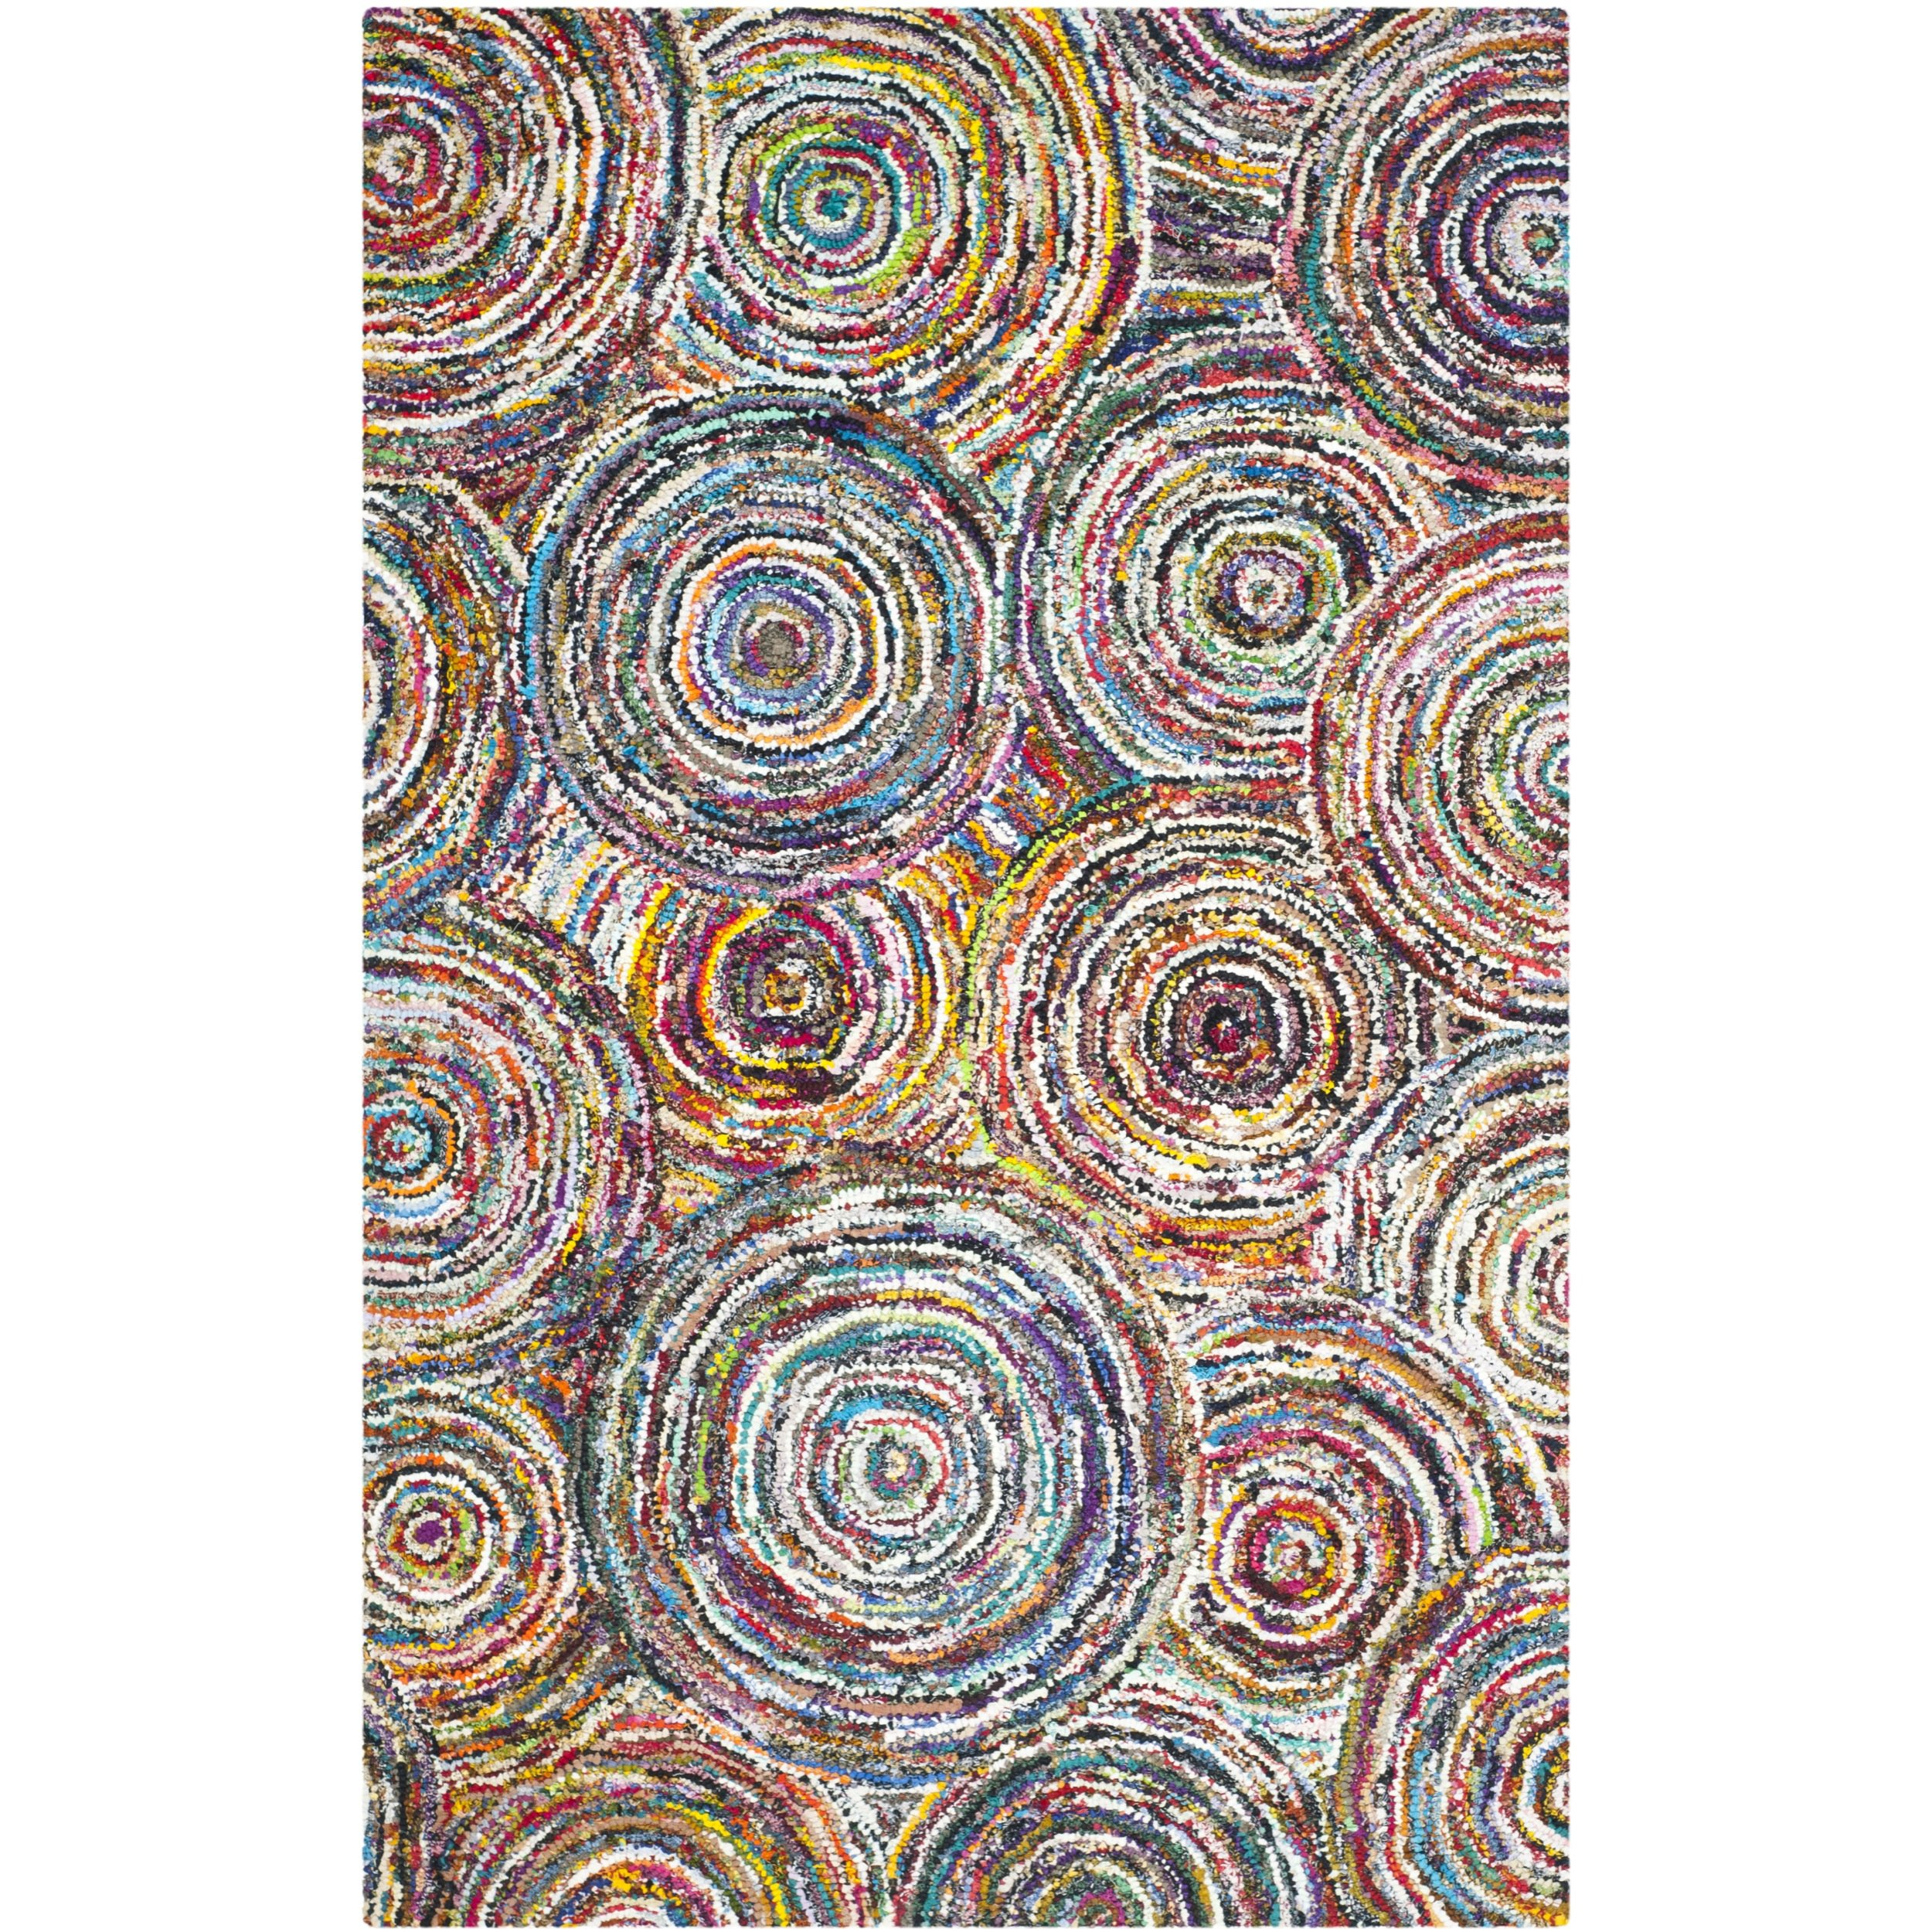 Safavieh Nantucket Collection NAN514A Handmade Abstract Circles Multicolored Cotton Area Rug (4' x 6') by Safavieh